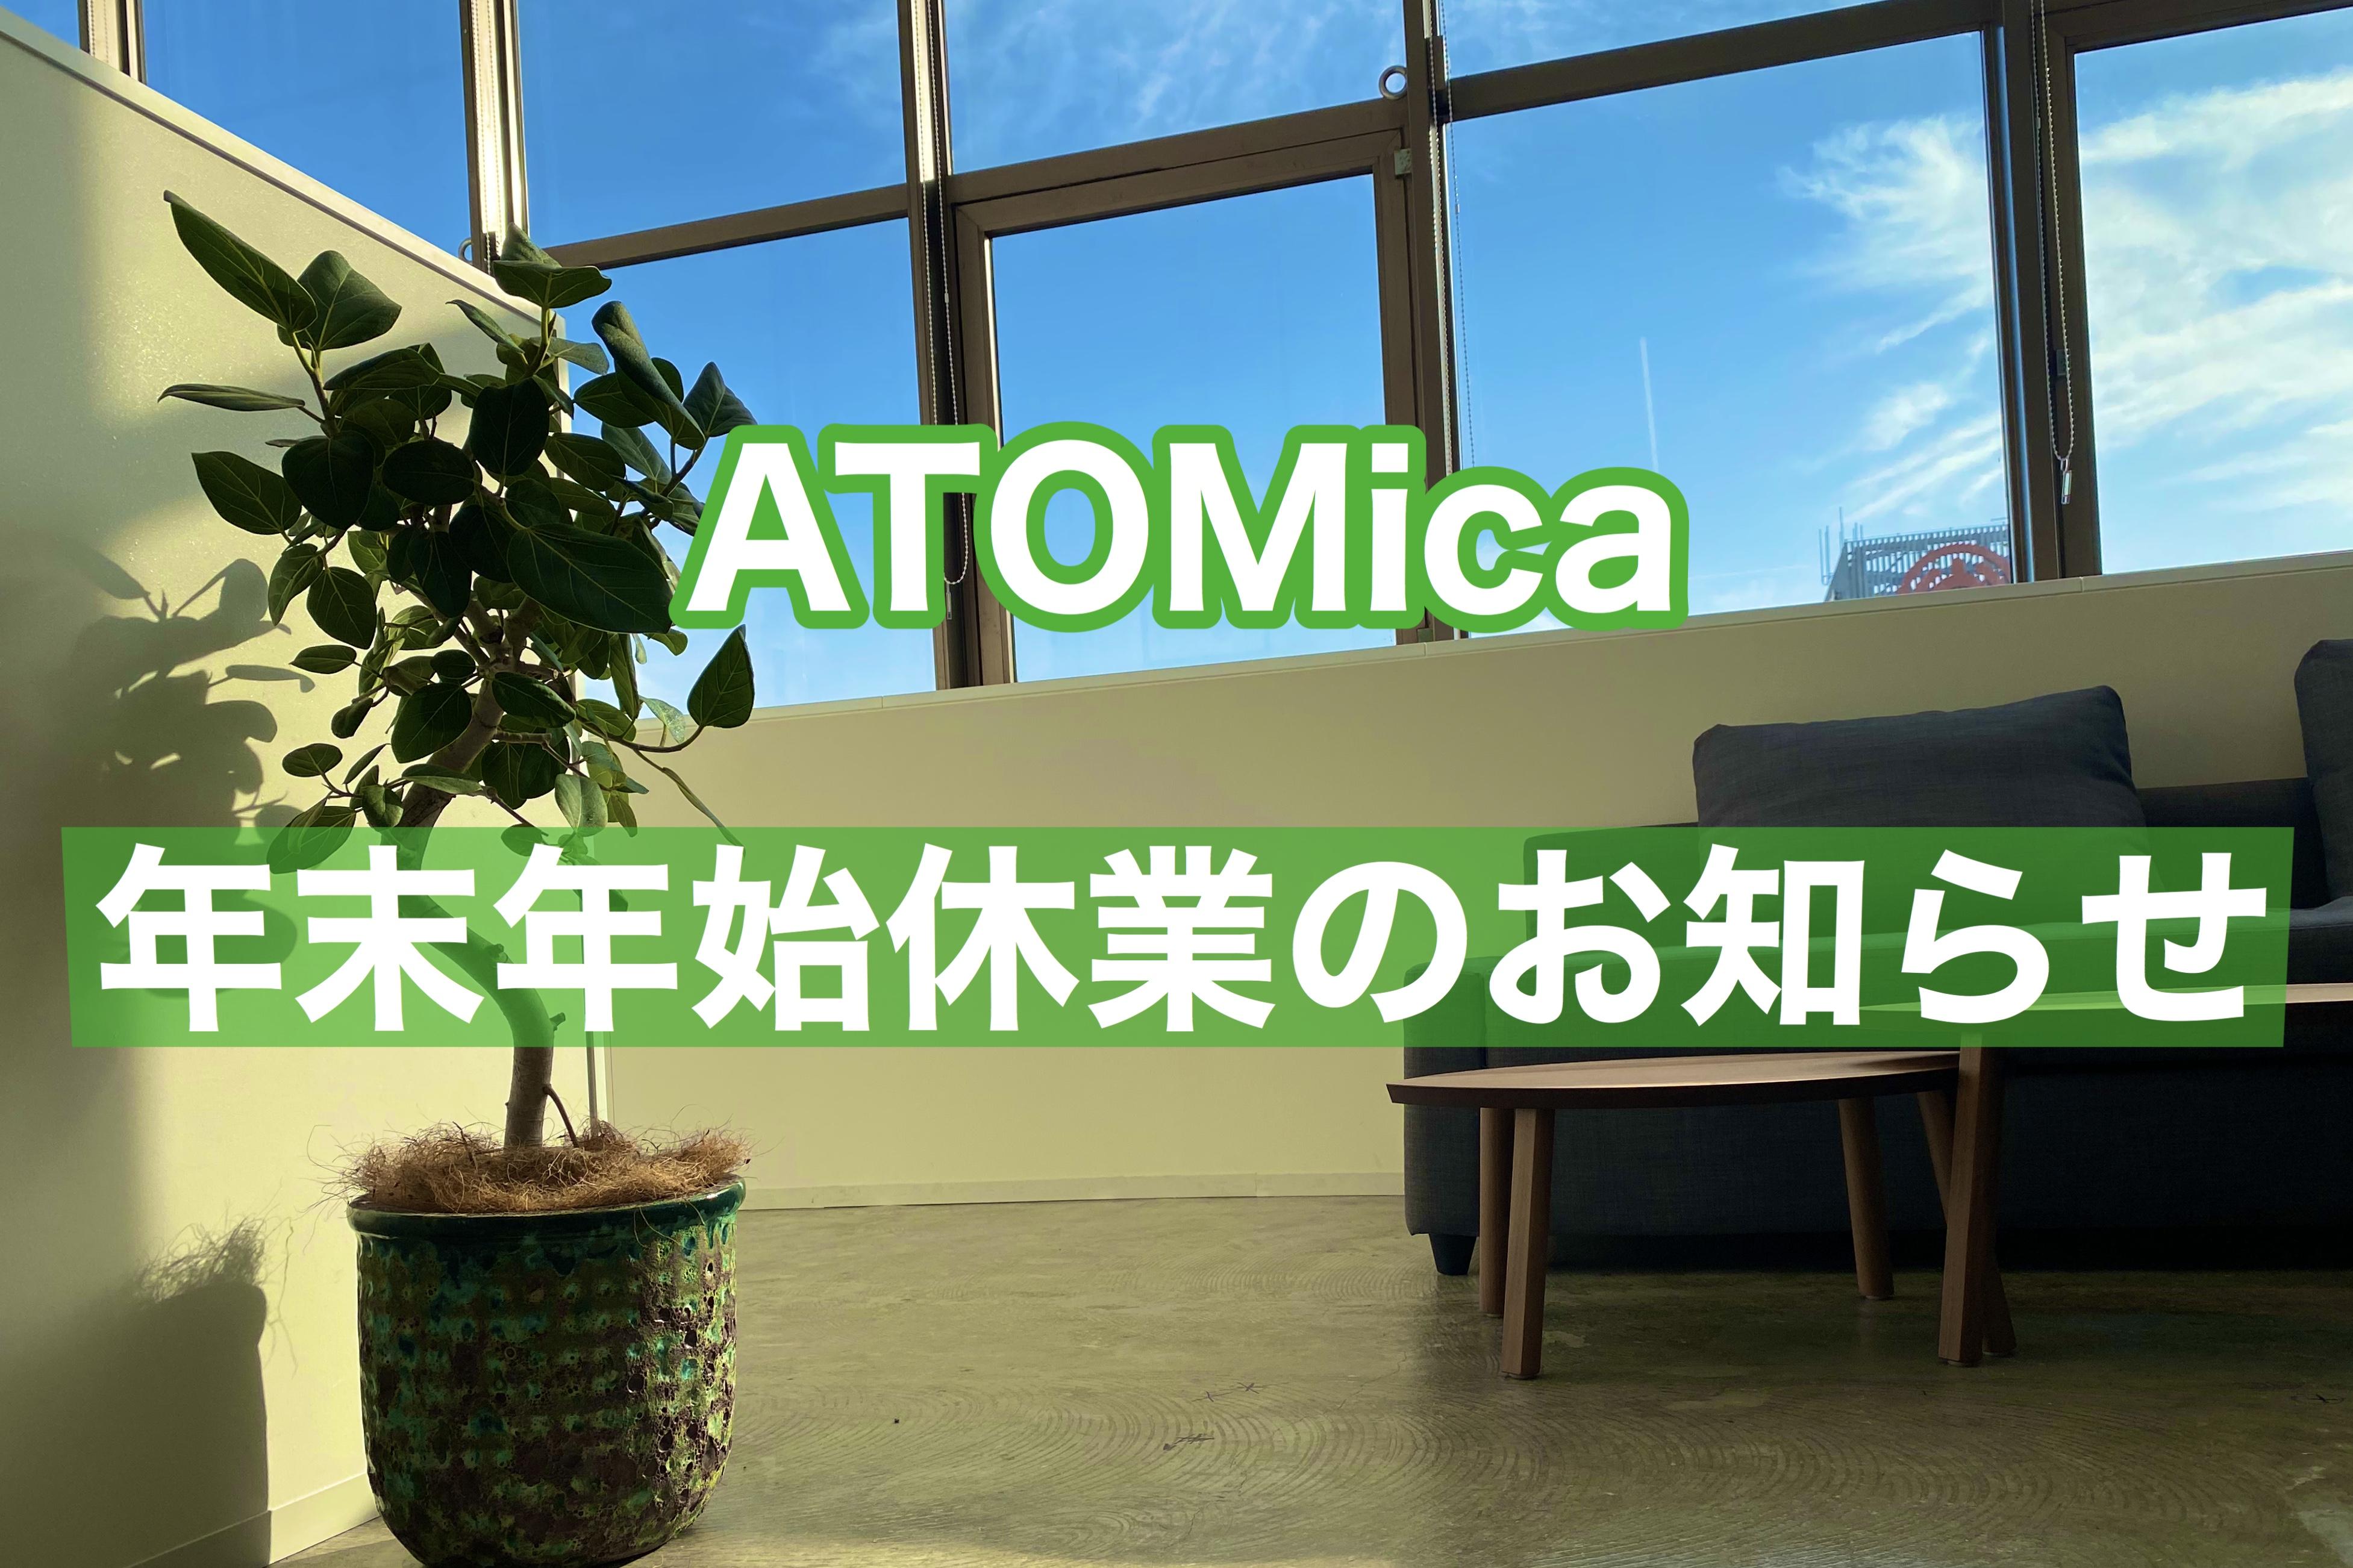 ATOMica -BLOGS- 年末年始休業のお知らせ